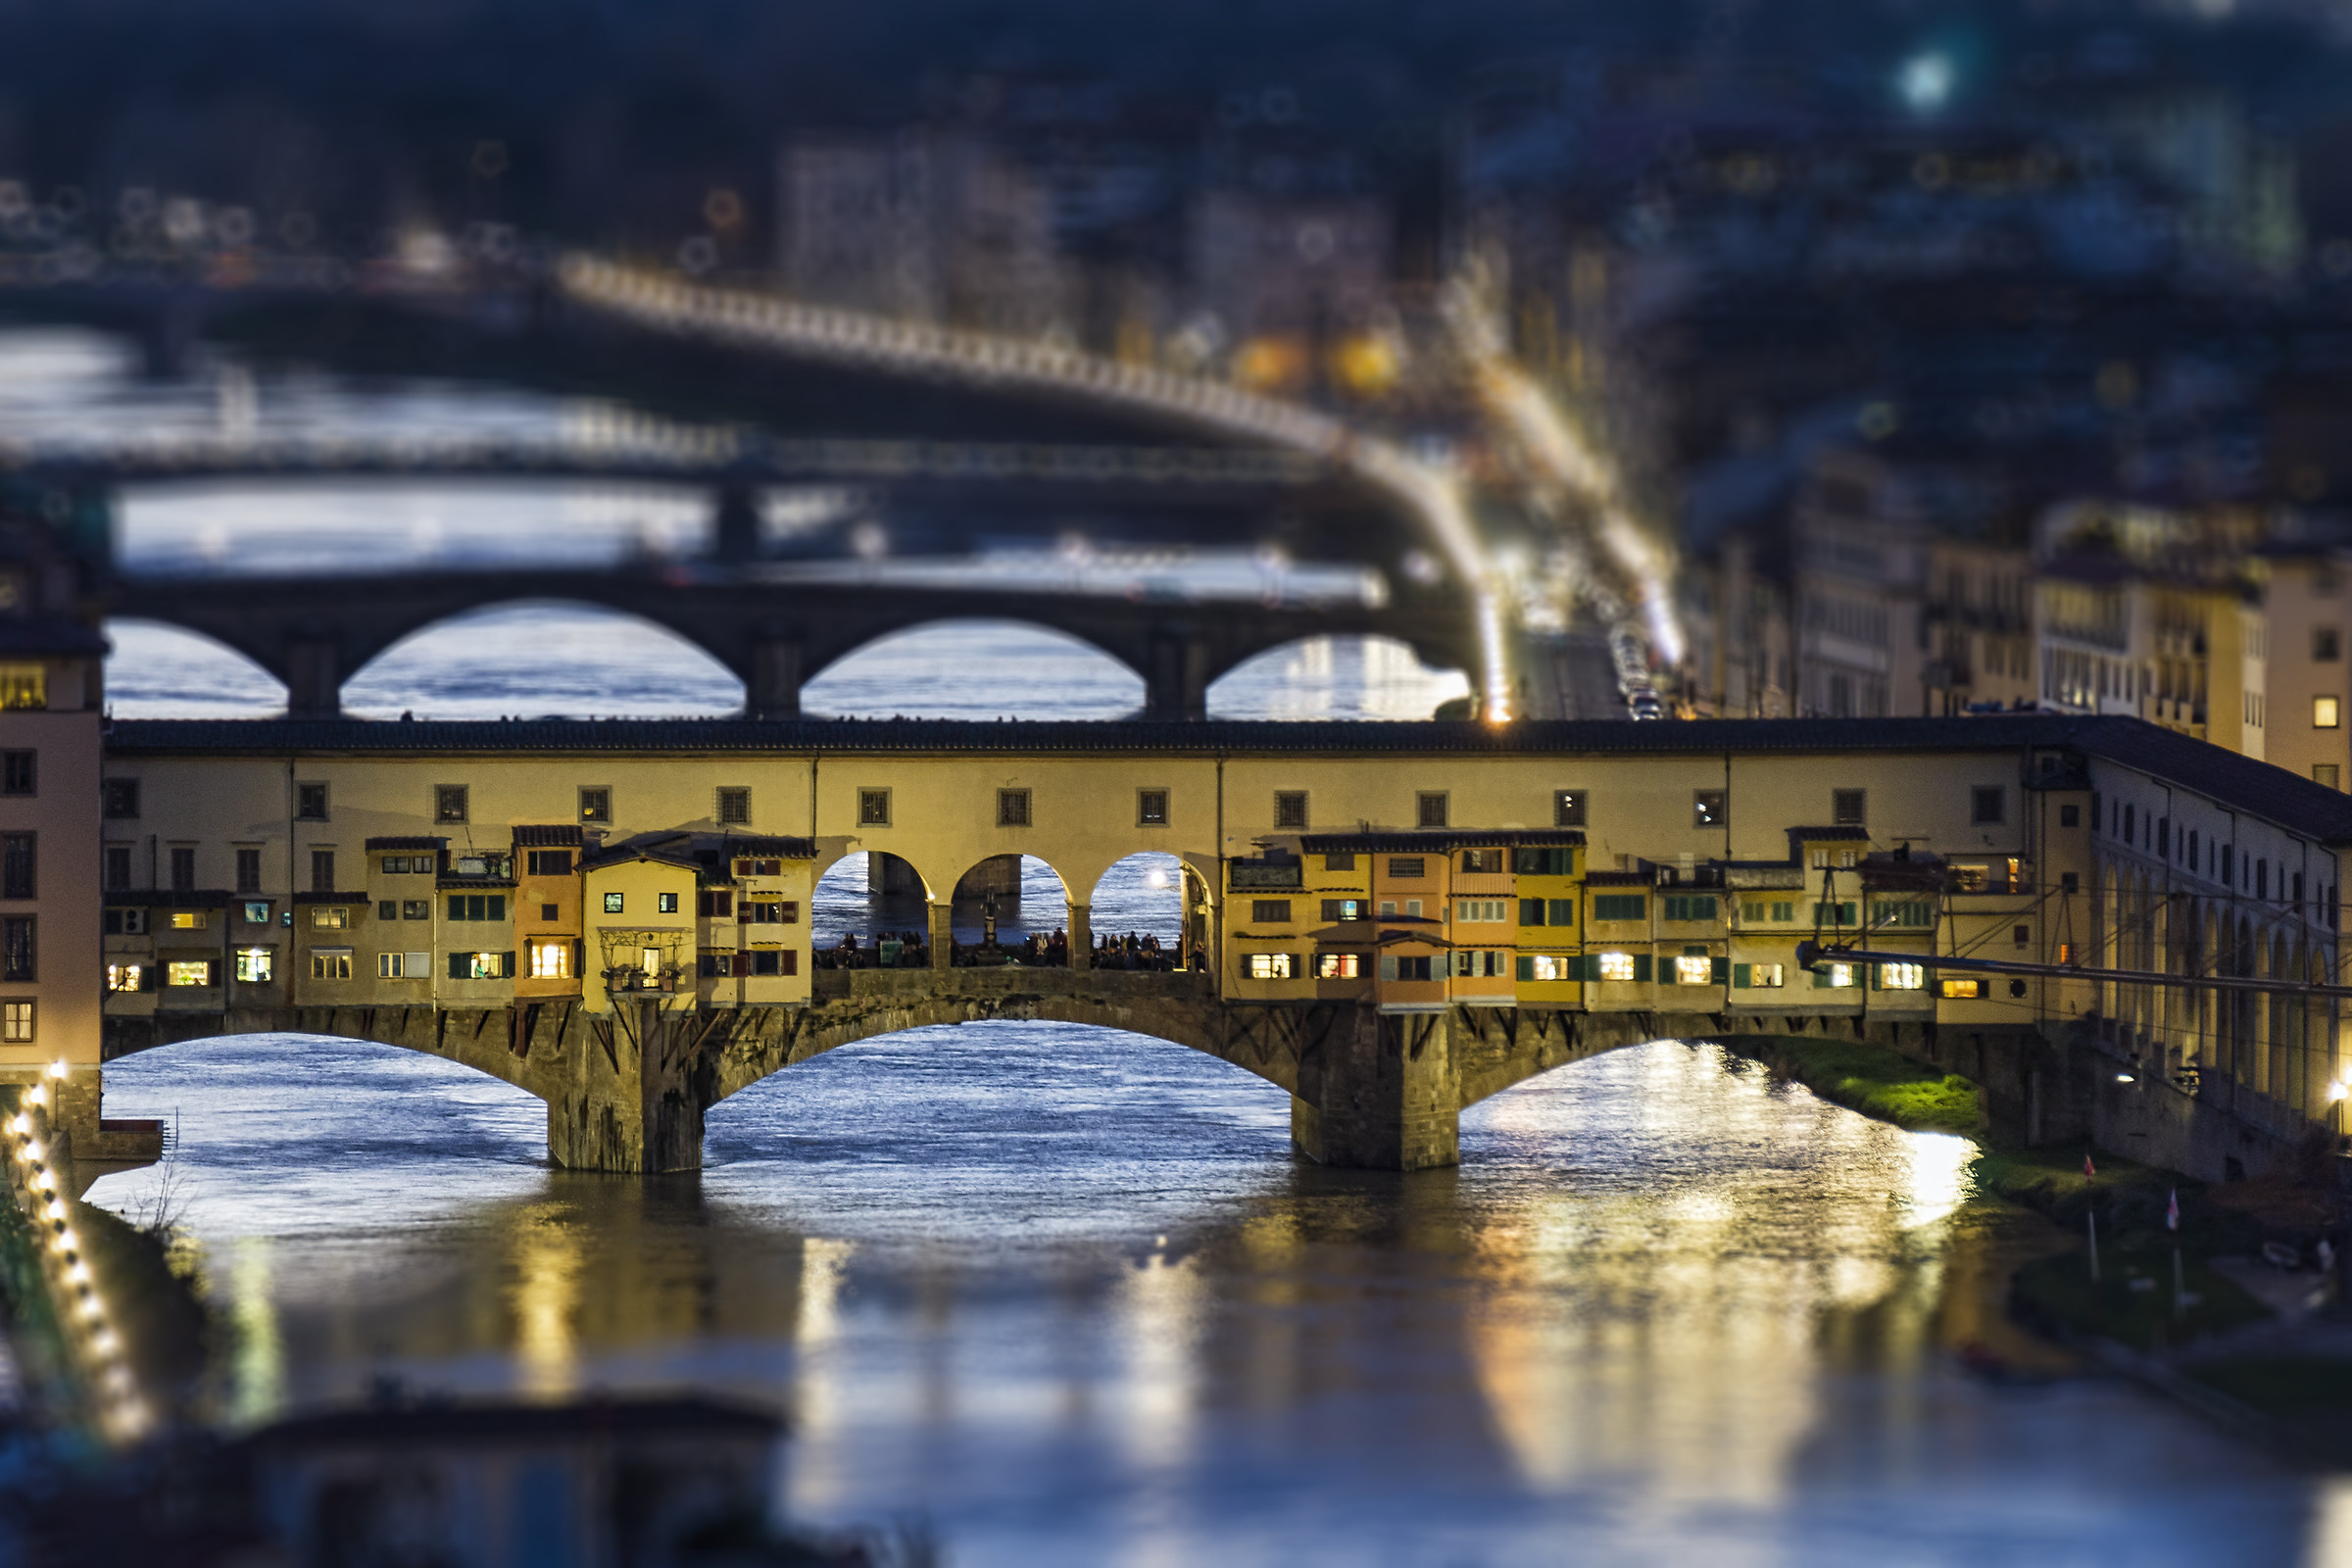 Tiny little Ponte Vecchio...